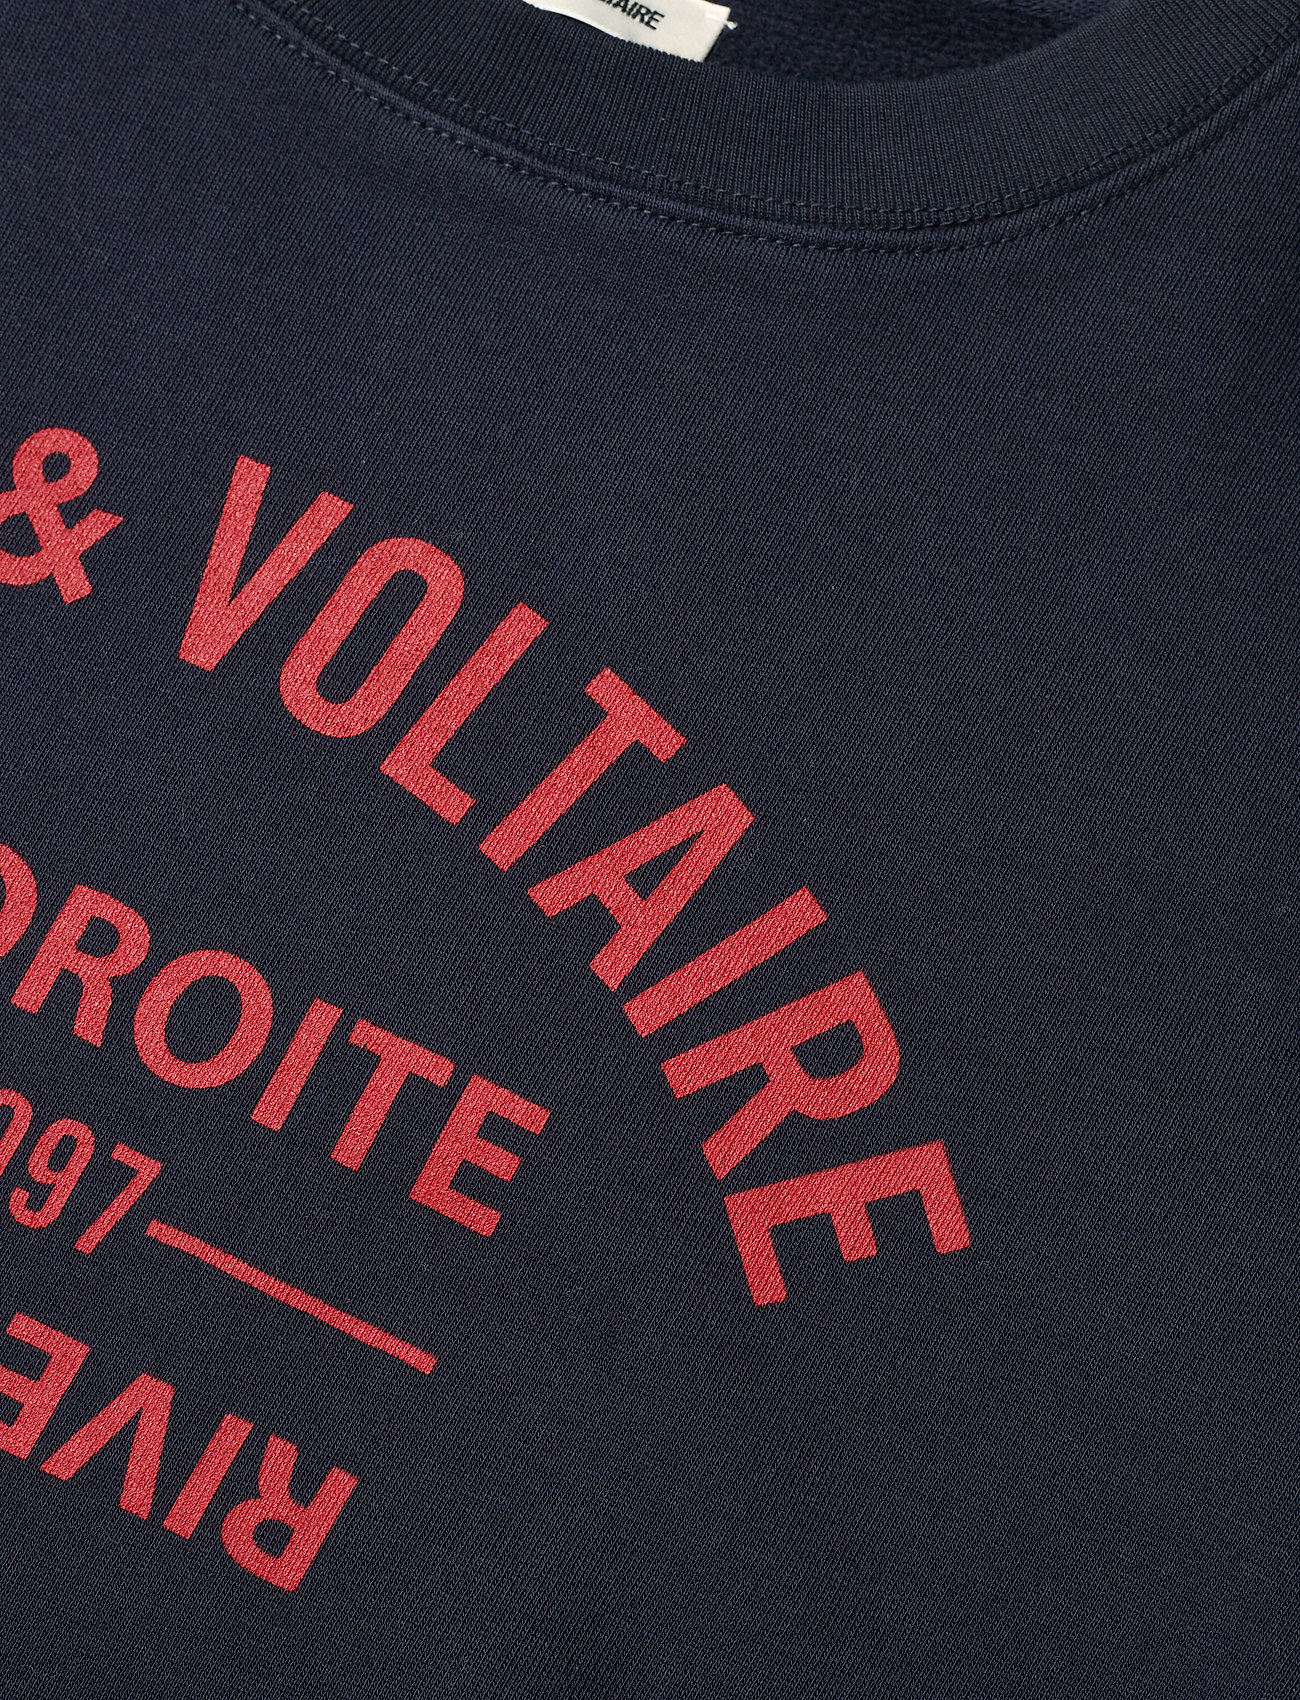 Zadig & Voltaire - CHAMP BLASON PRINTED CO/ MODAL SWEATSHIRT - sweatshirts & hættetrøjer - encre - 3